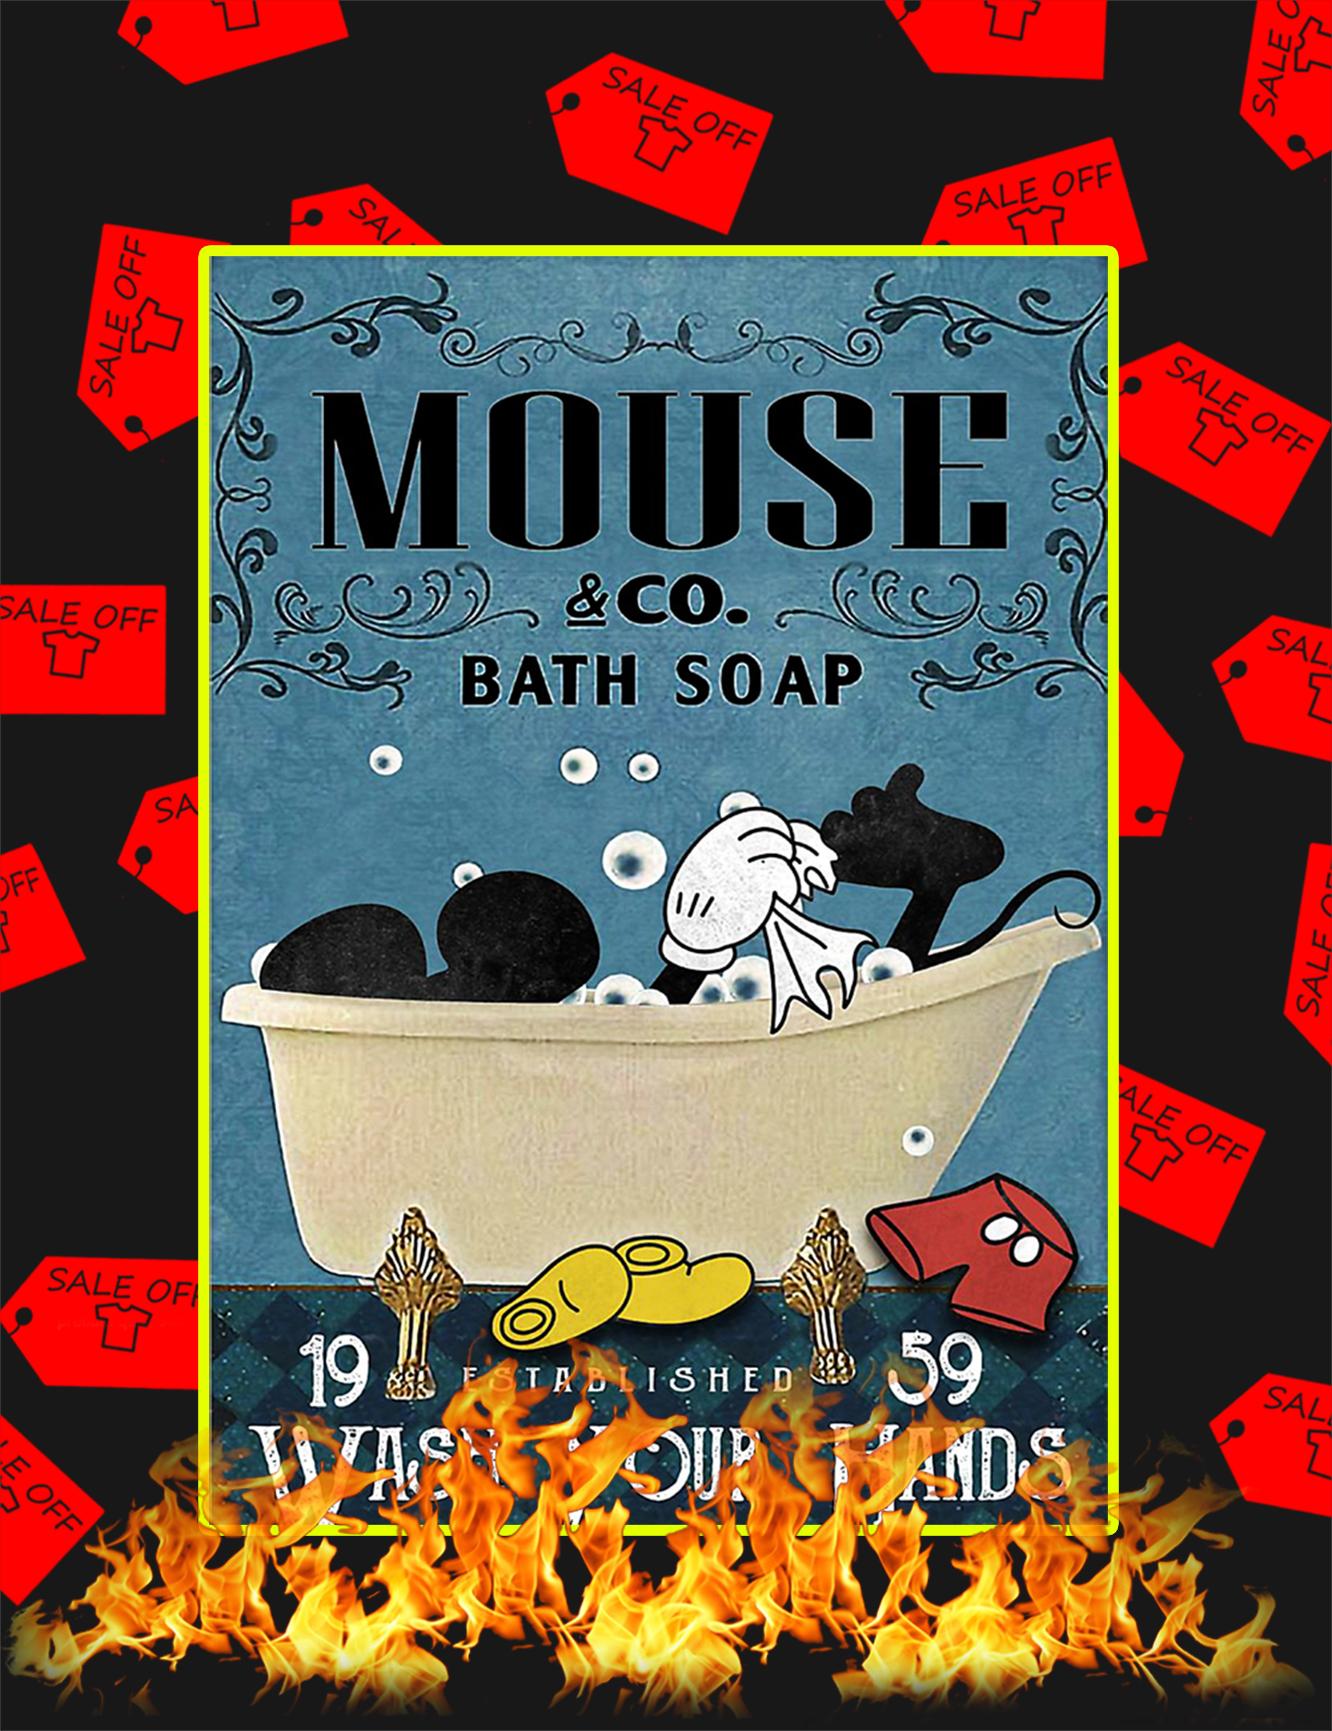 Bath soap company mickey mouse poster a4